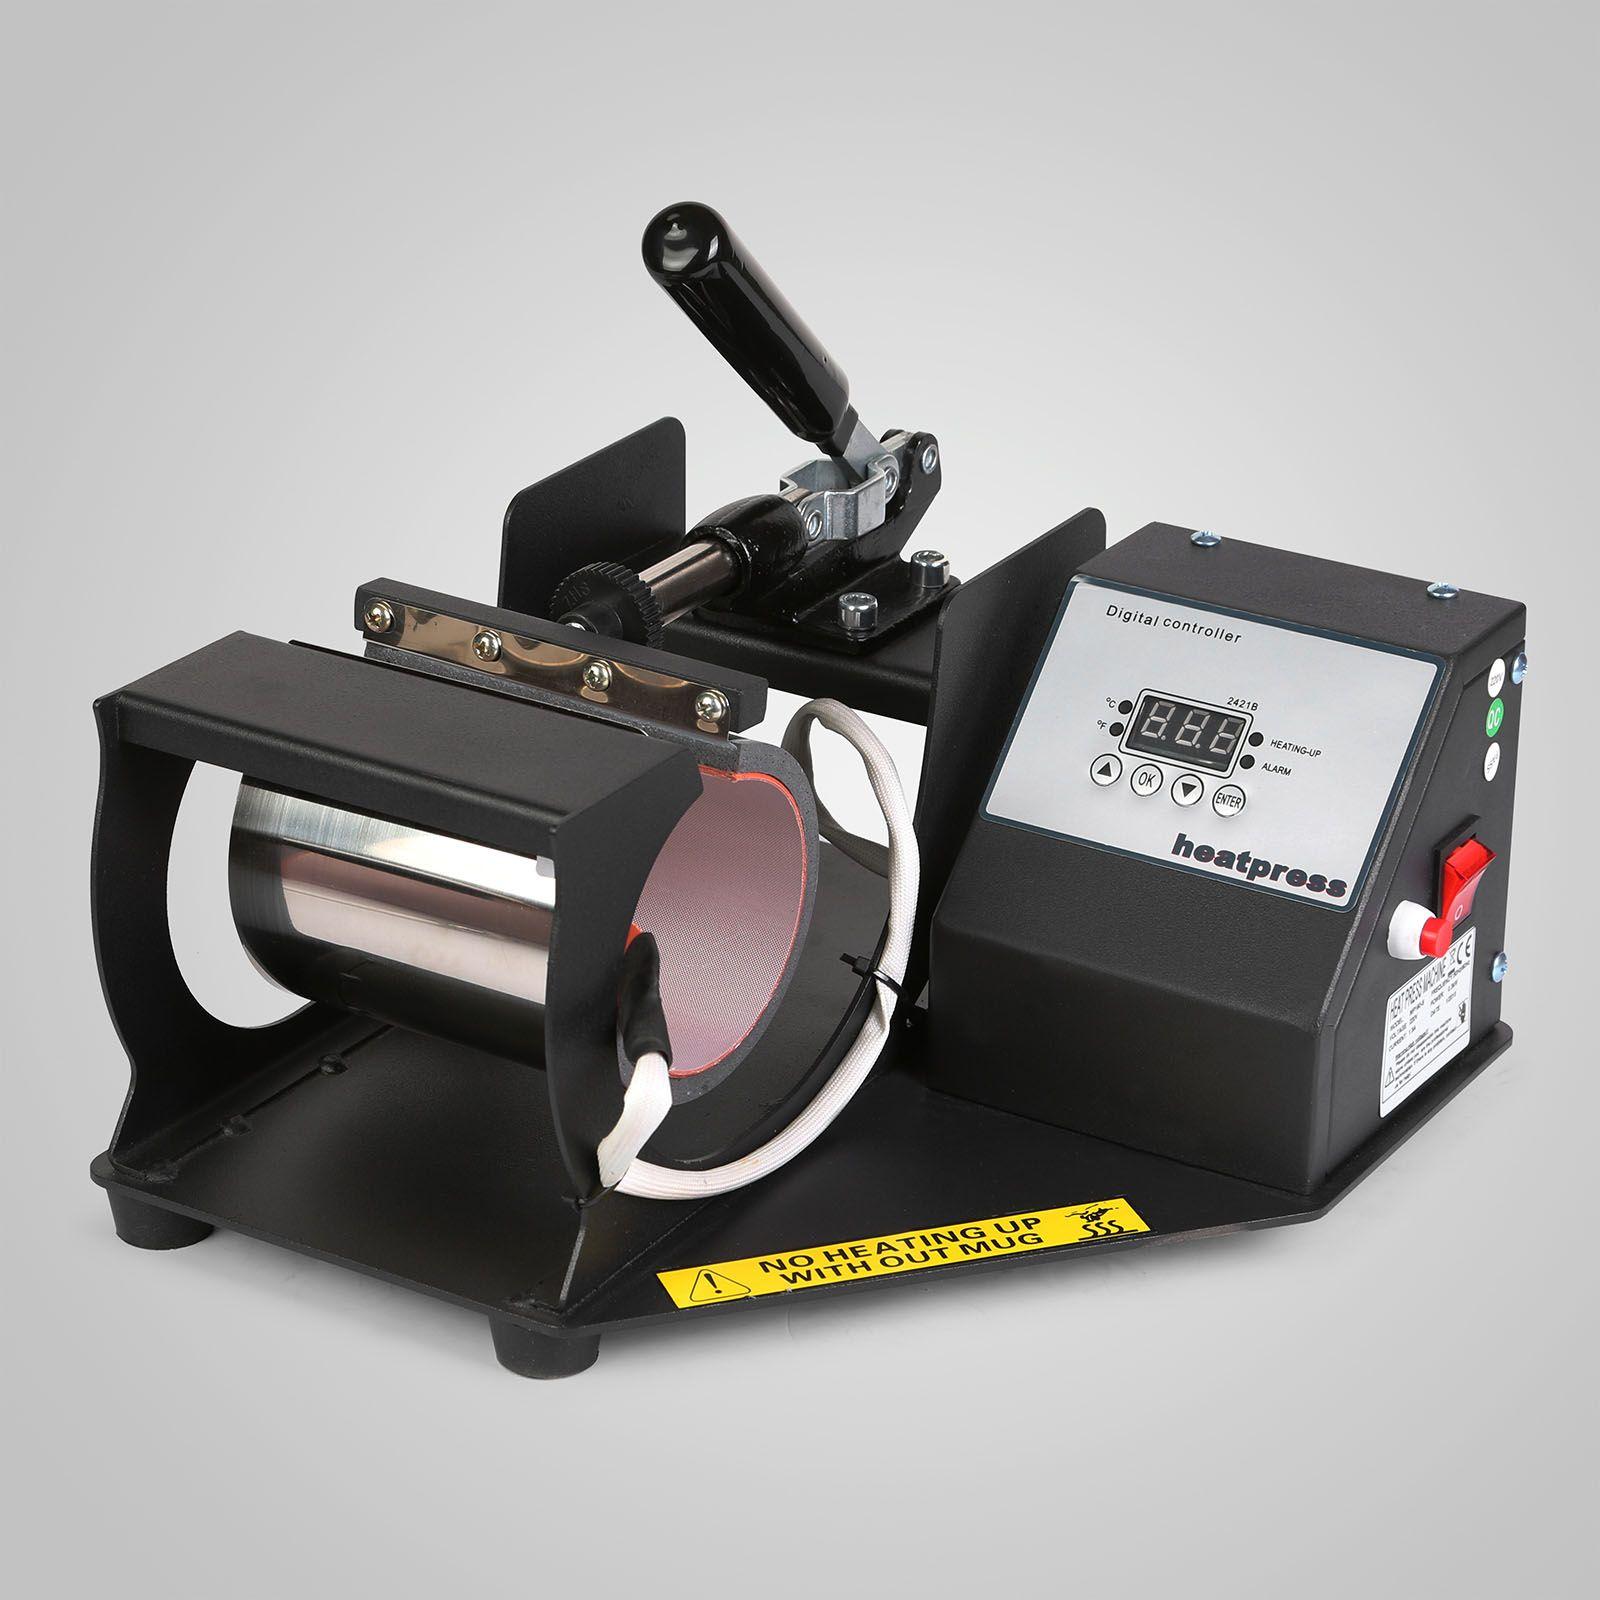 2in1 القدح كأس الحرارة الصحافة نقل الرقمية فنجان القهوة اتيه القدح الحرارة آلة الطباعة التسامي الصلب الإطار